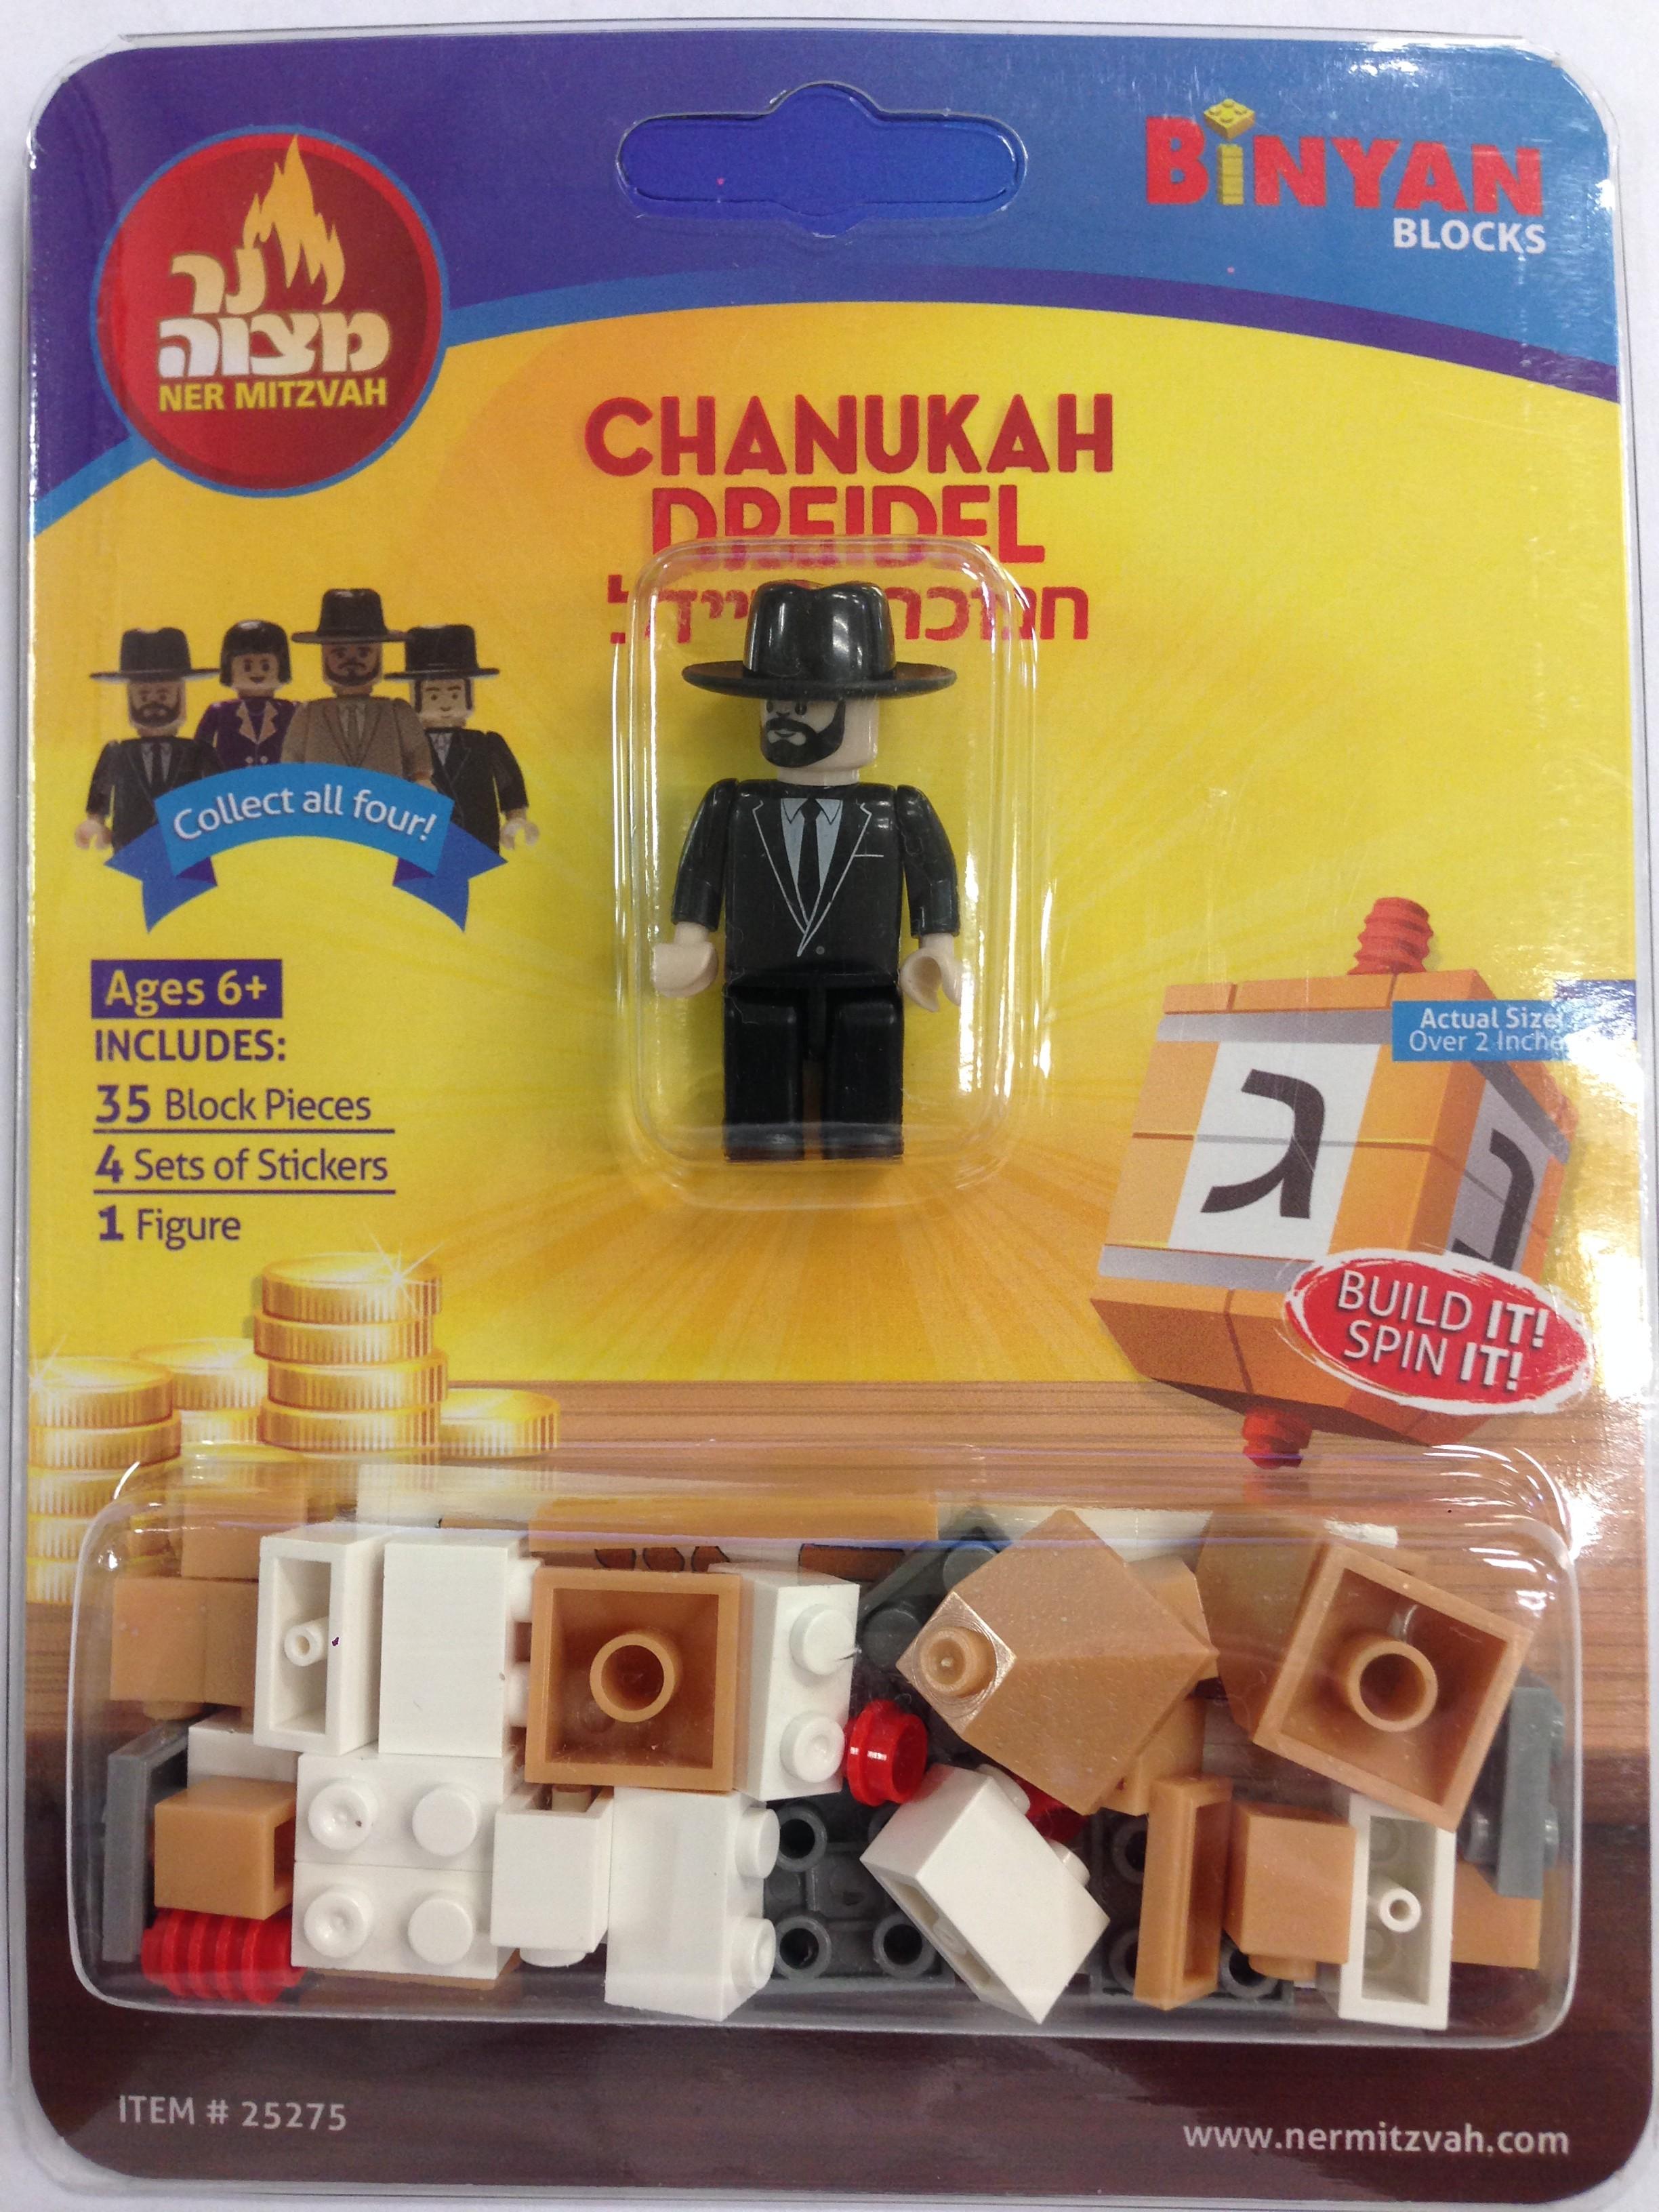 Dreidel Lego kit